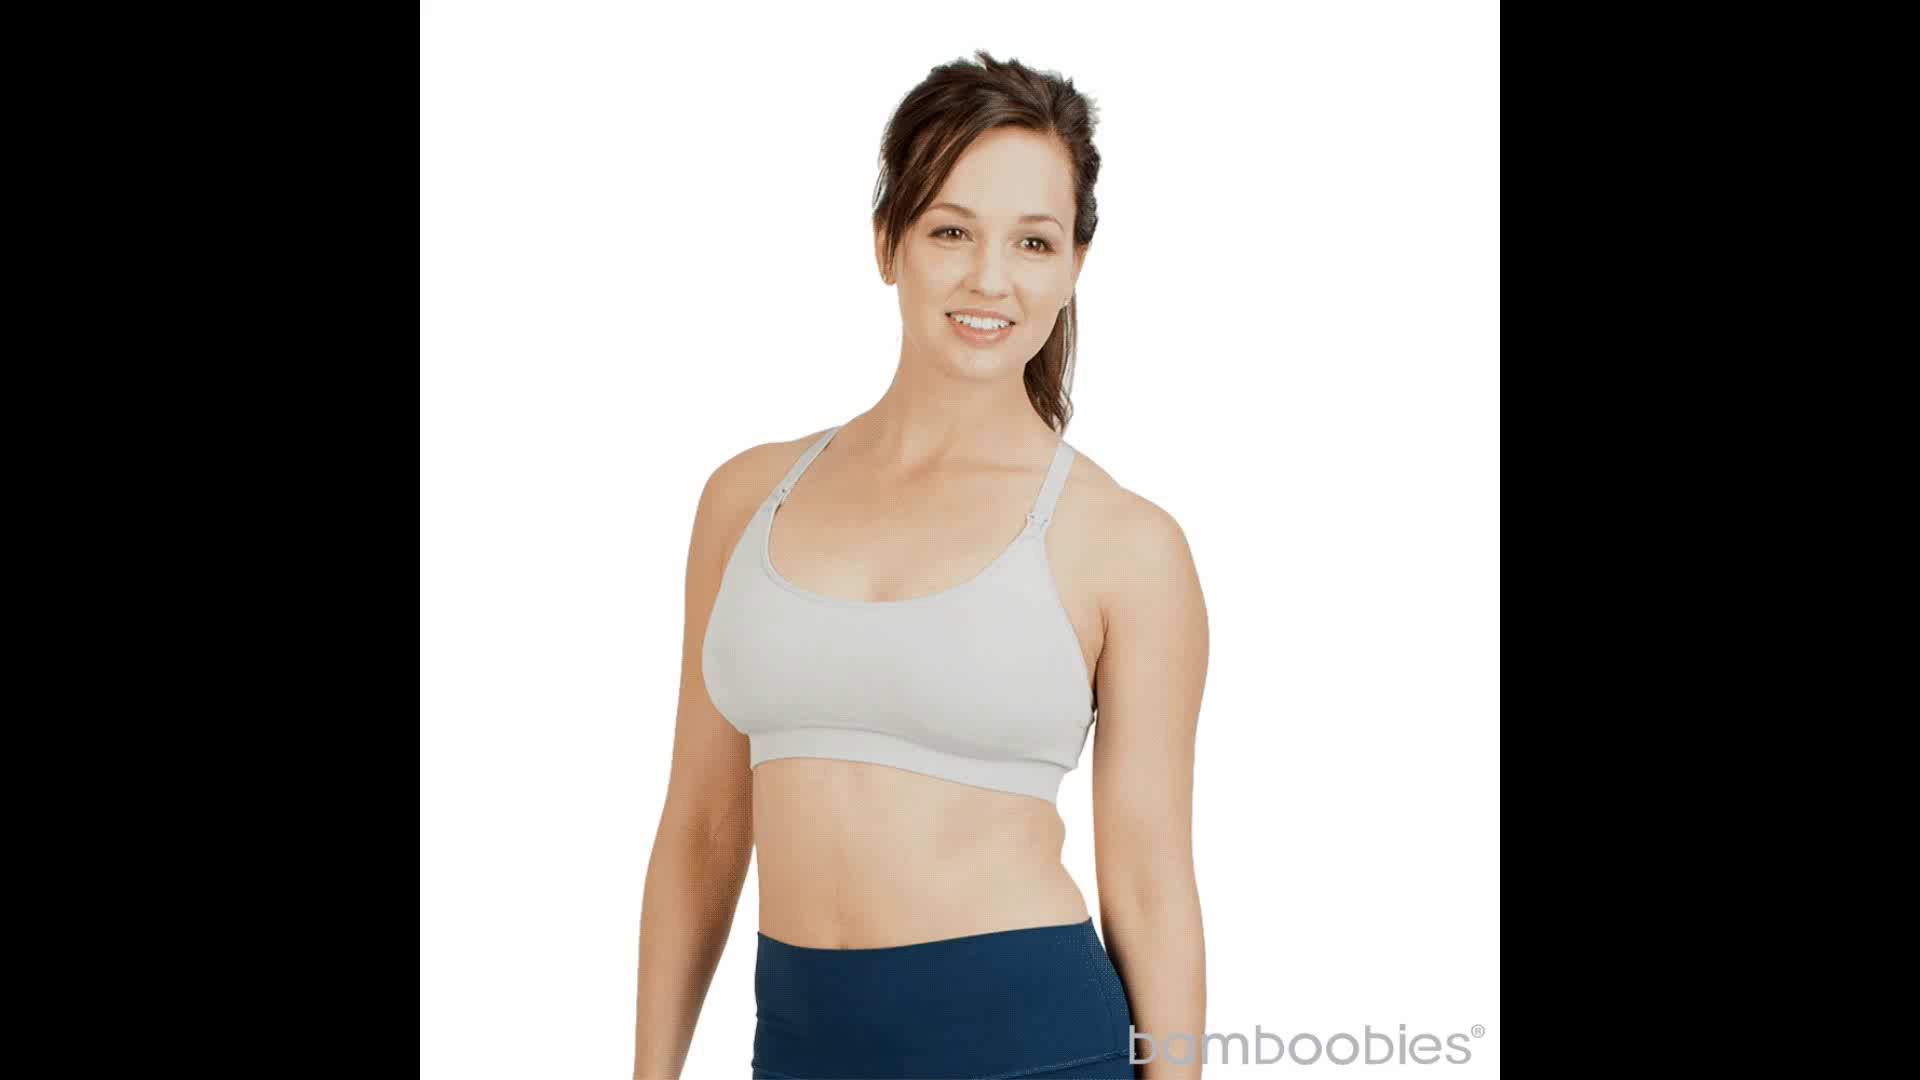 a53ebb5983277 bamboobies Maternity Seamless Yoga Nursing Bra for Breastfeeding ...